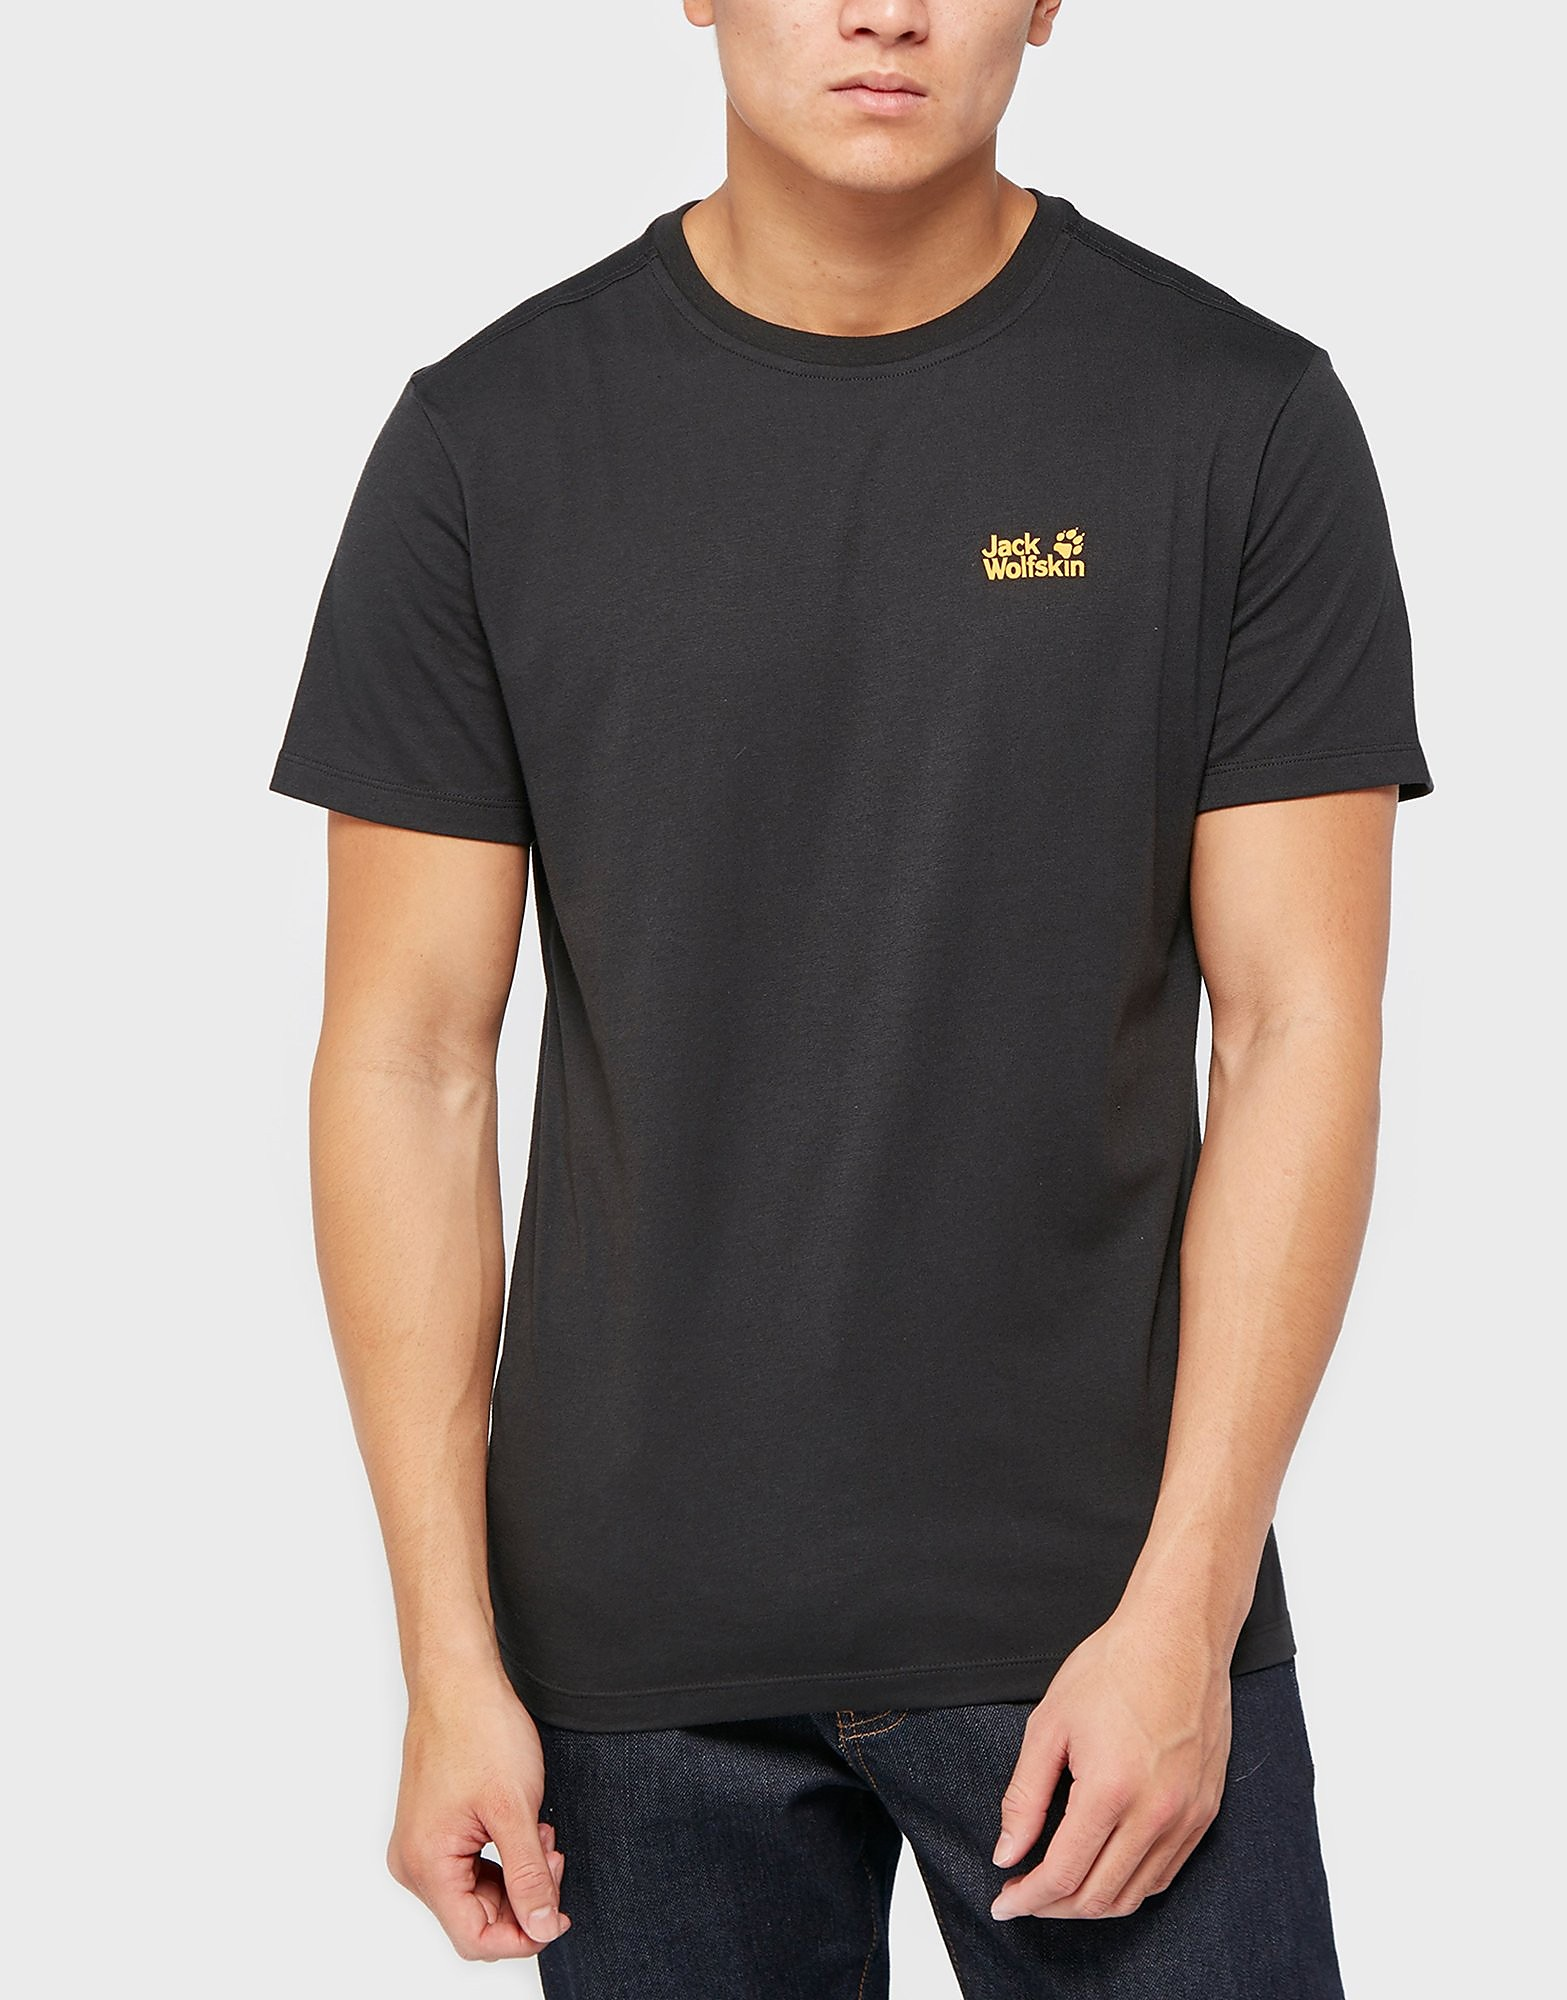 Jack Wolfskin Crew T-Shirt